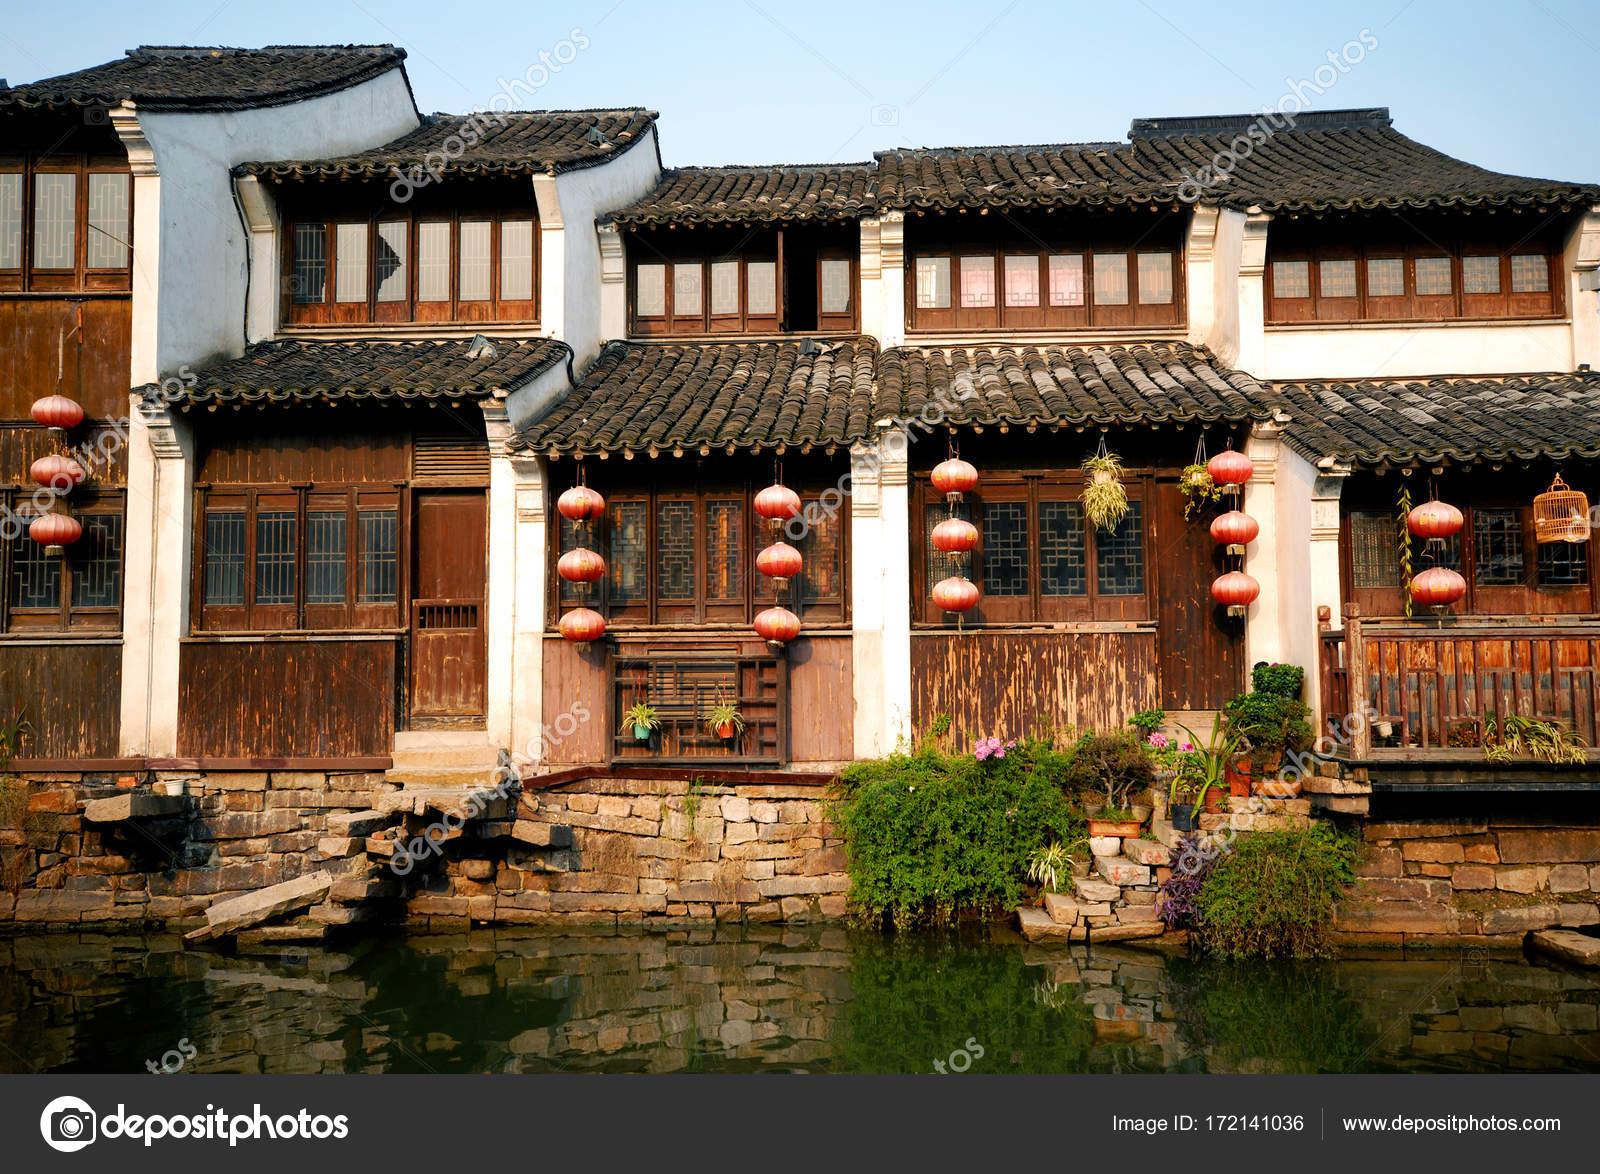 Case Tradizionali Cinesi : Descrizione di sei tipi di case cinesi tradizionali